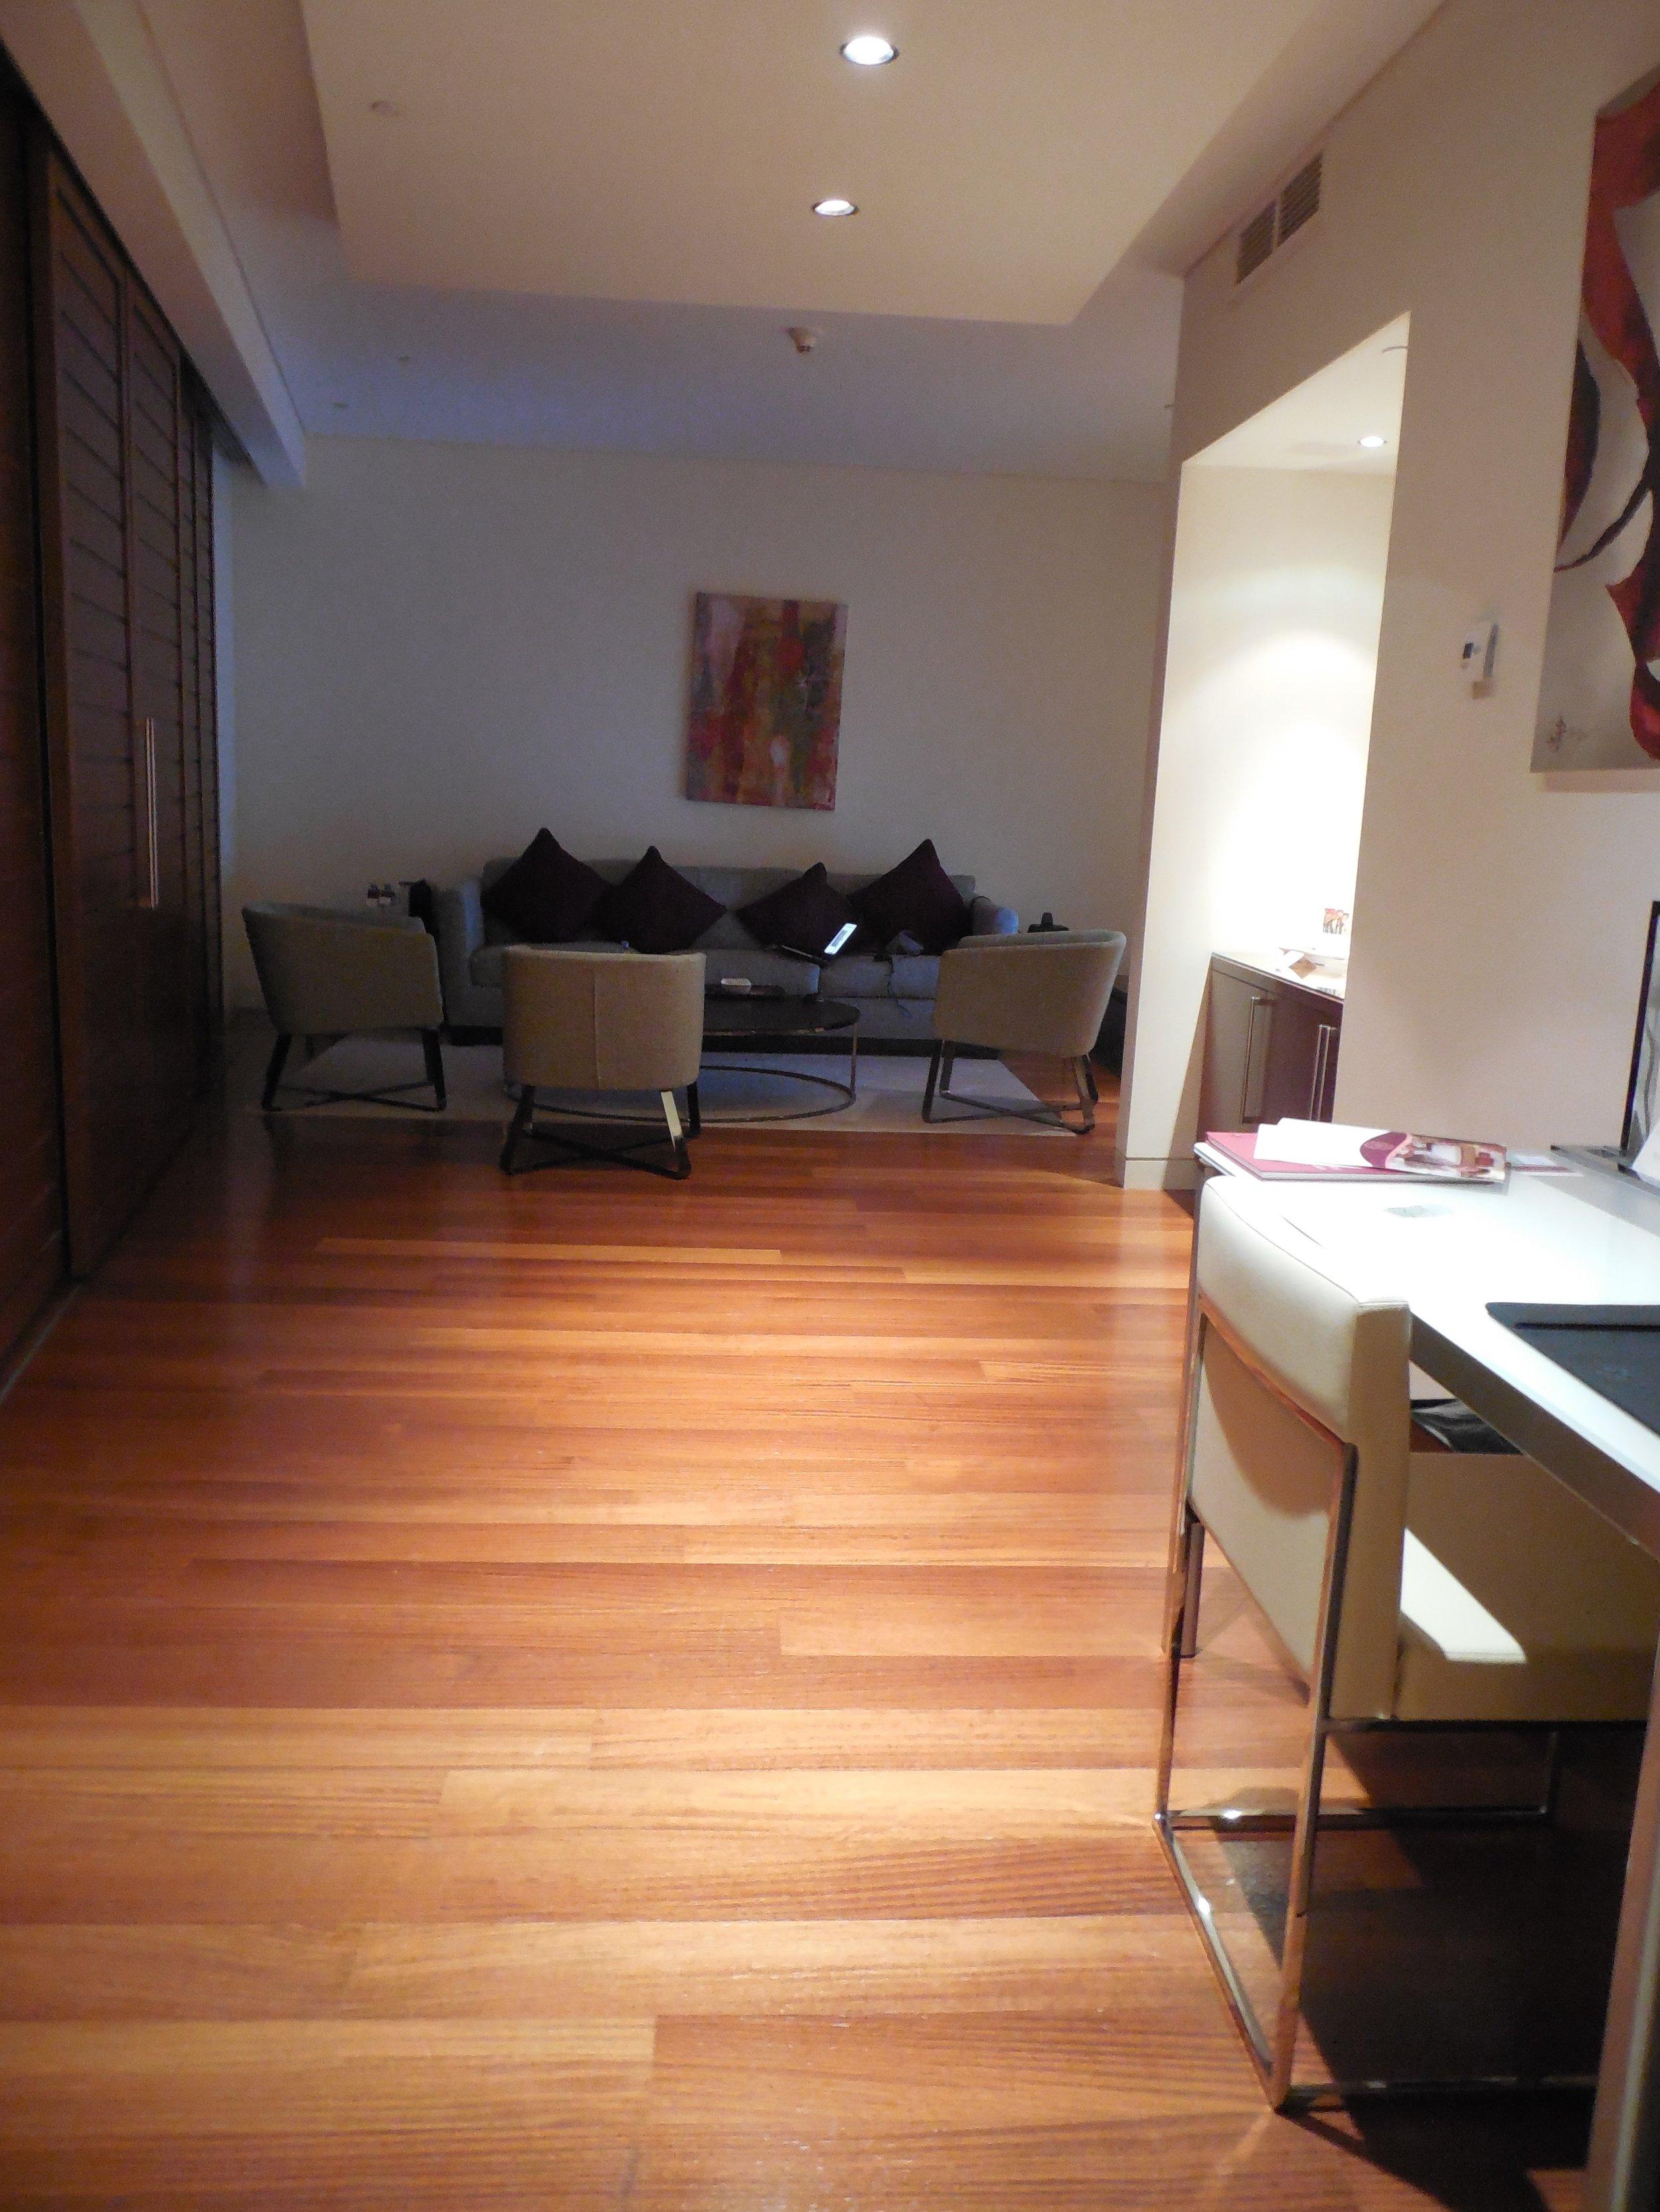 Suite Sitting & Desk Area Oryx Airport Hotel © Flyga Twiga LLC